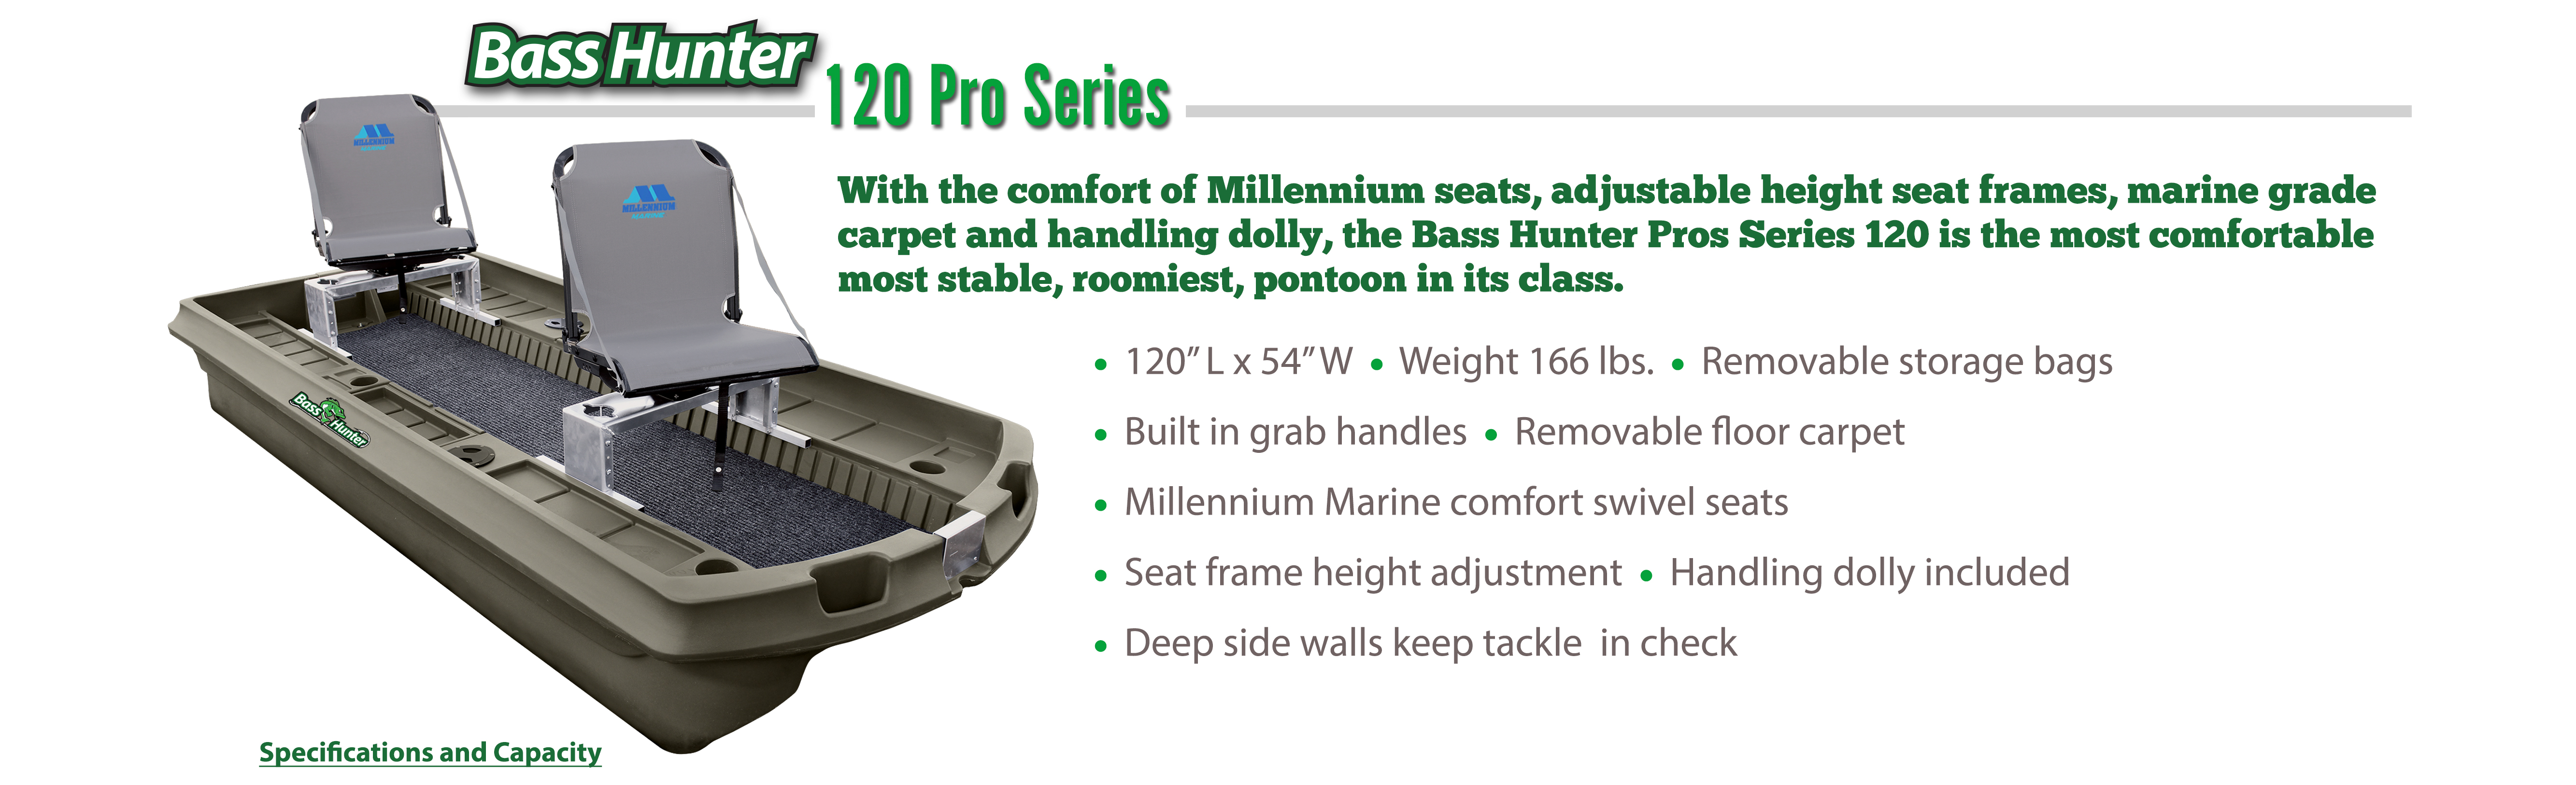 Bass Hunter 120 Pro Series